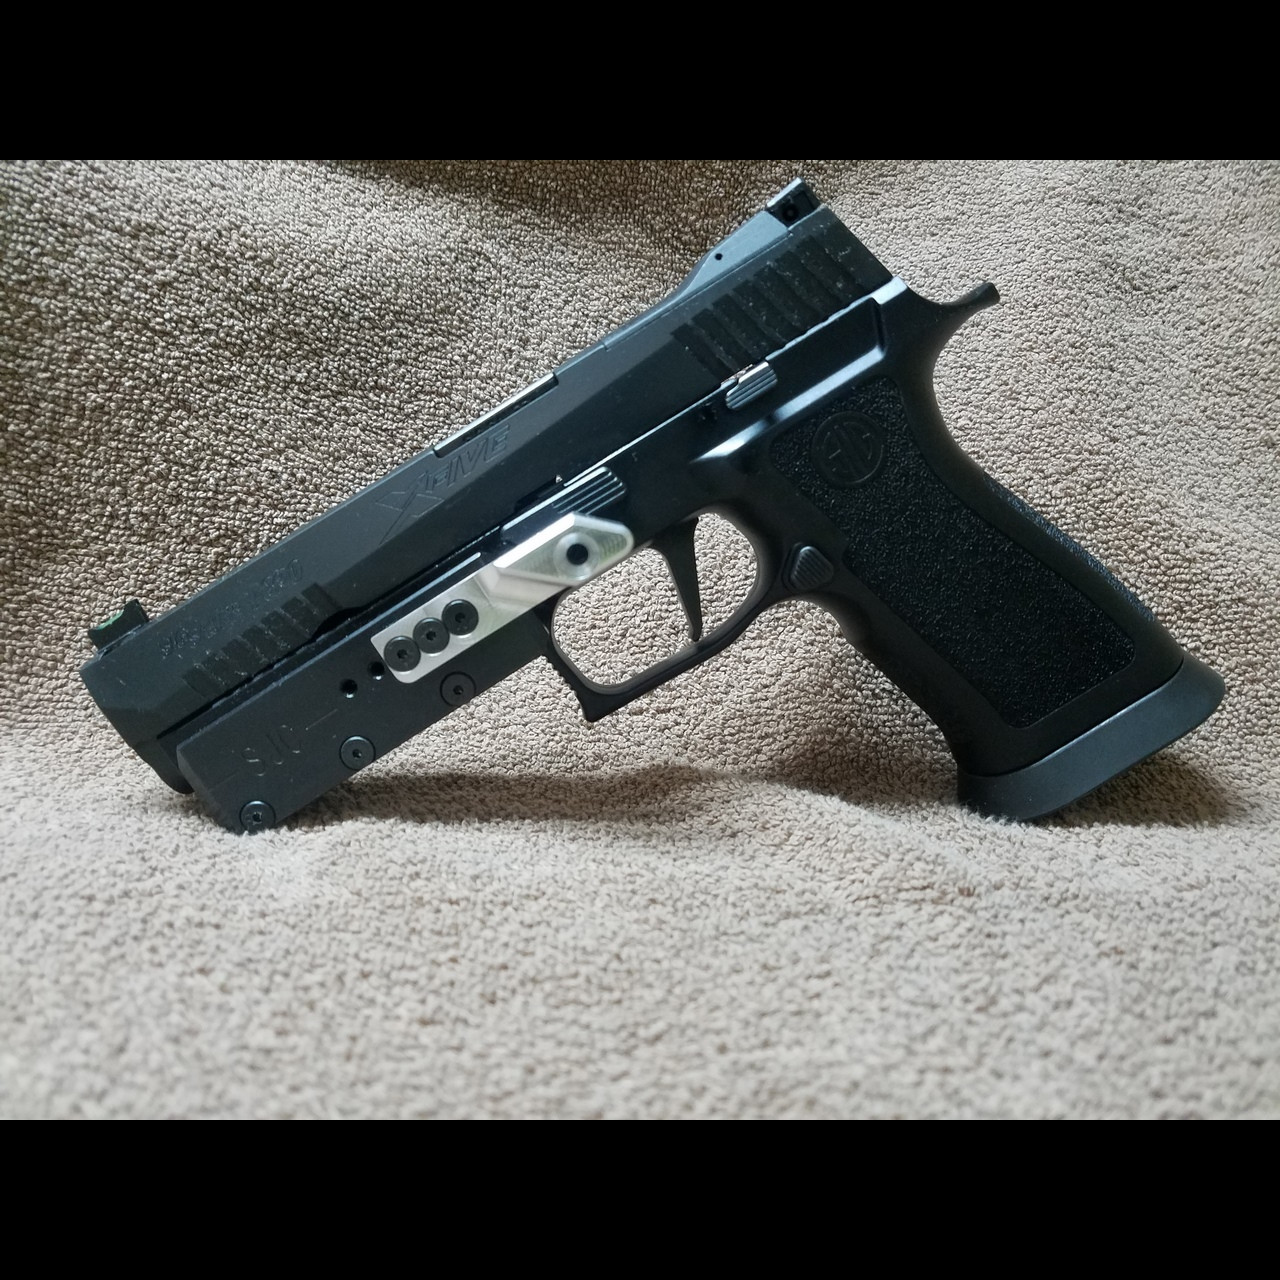 SJC P320 Sig frame weight